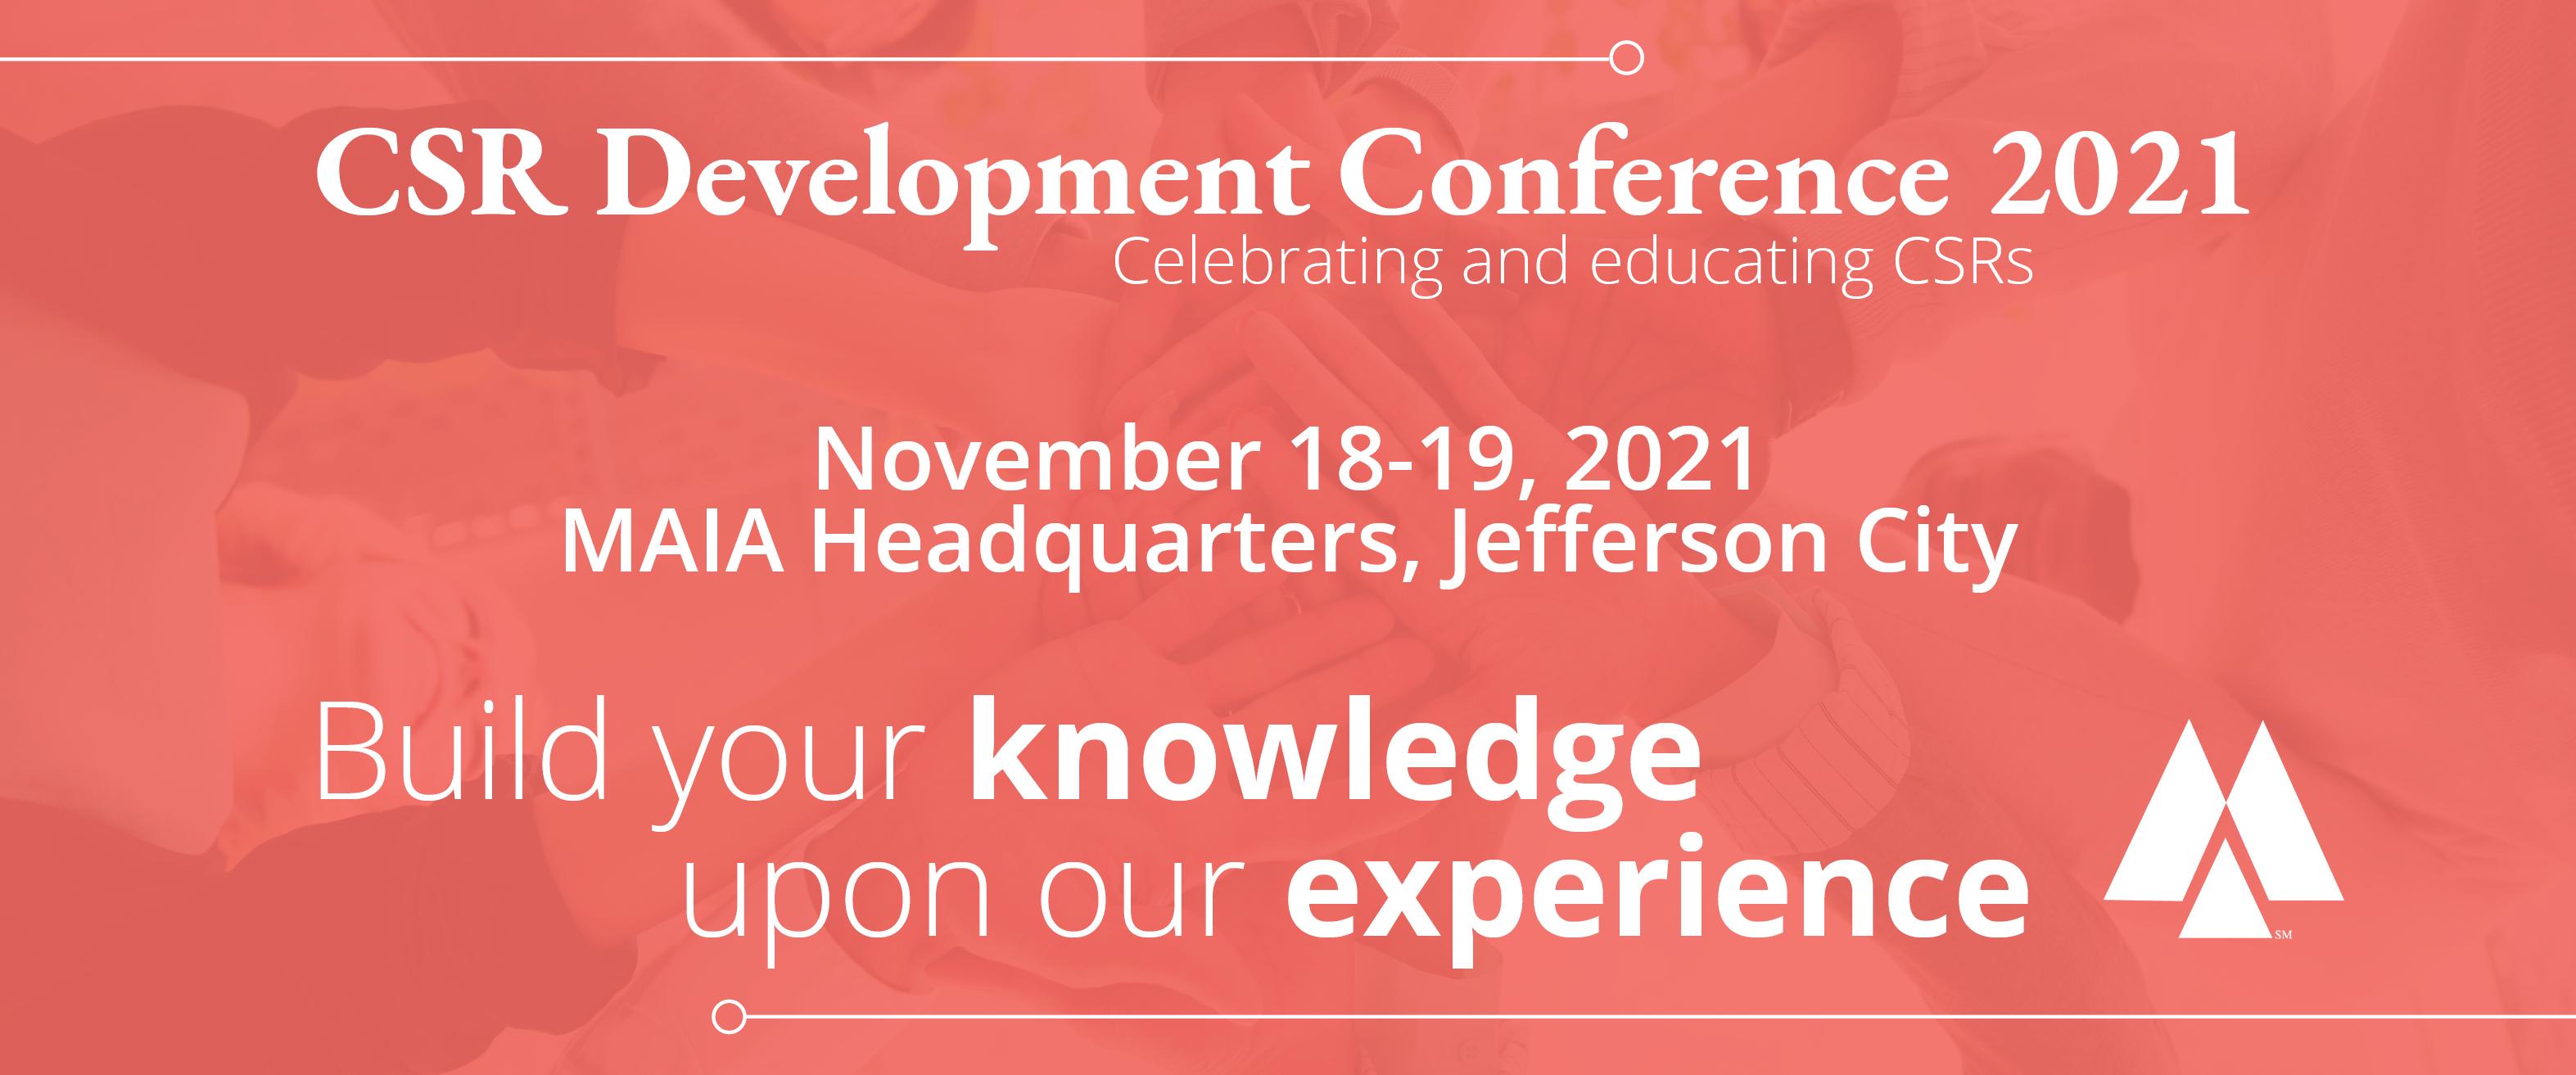 CSR Development Conference